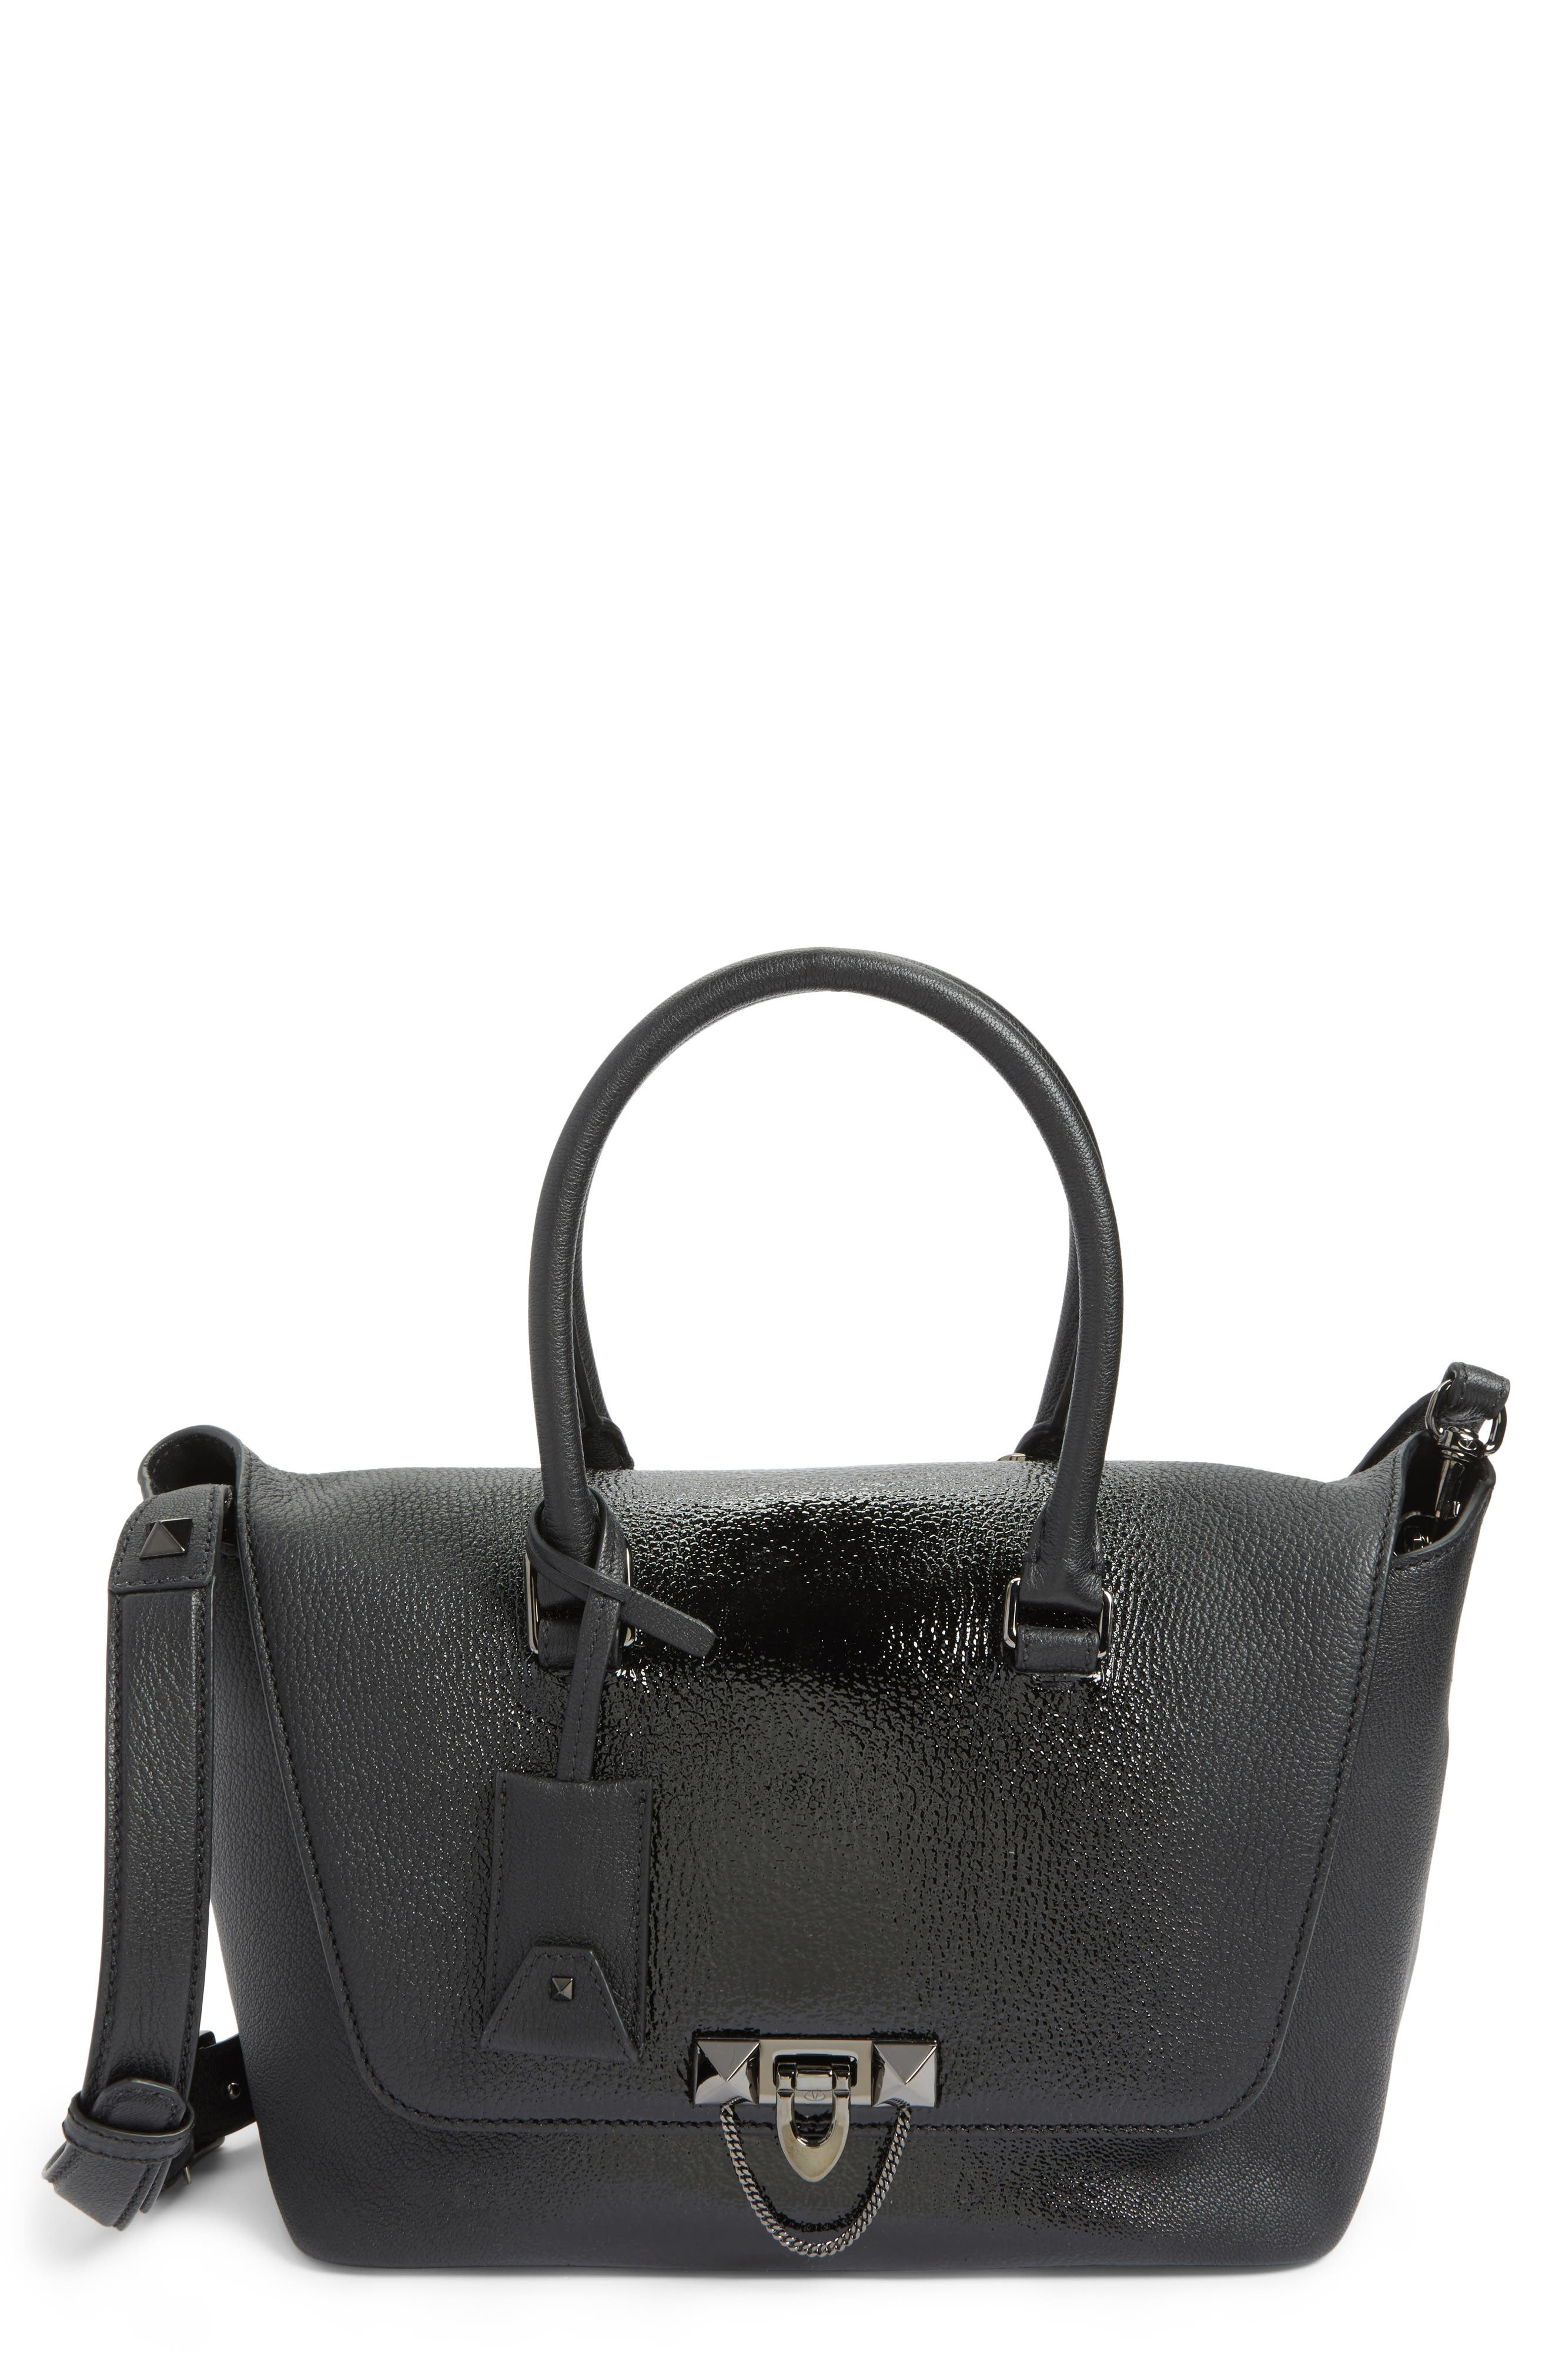 Alternate Image 1 Selected - VALENTINO GARAVANI Demilune Top Handle Leather Satchel